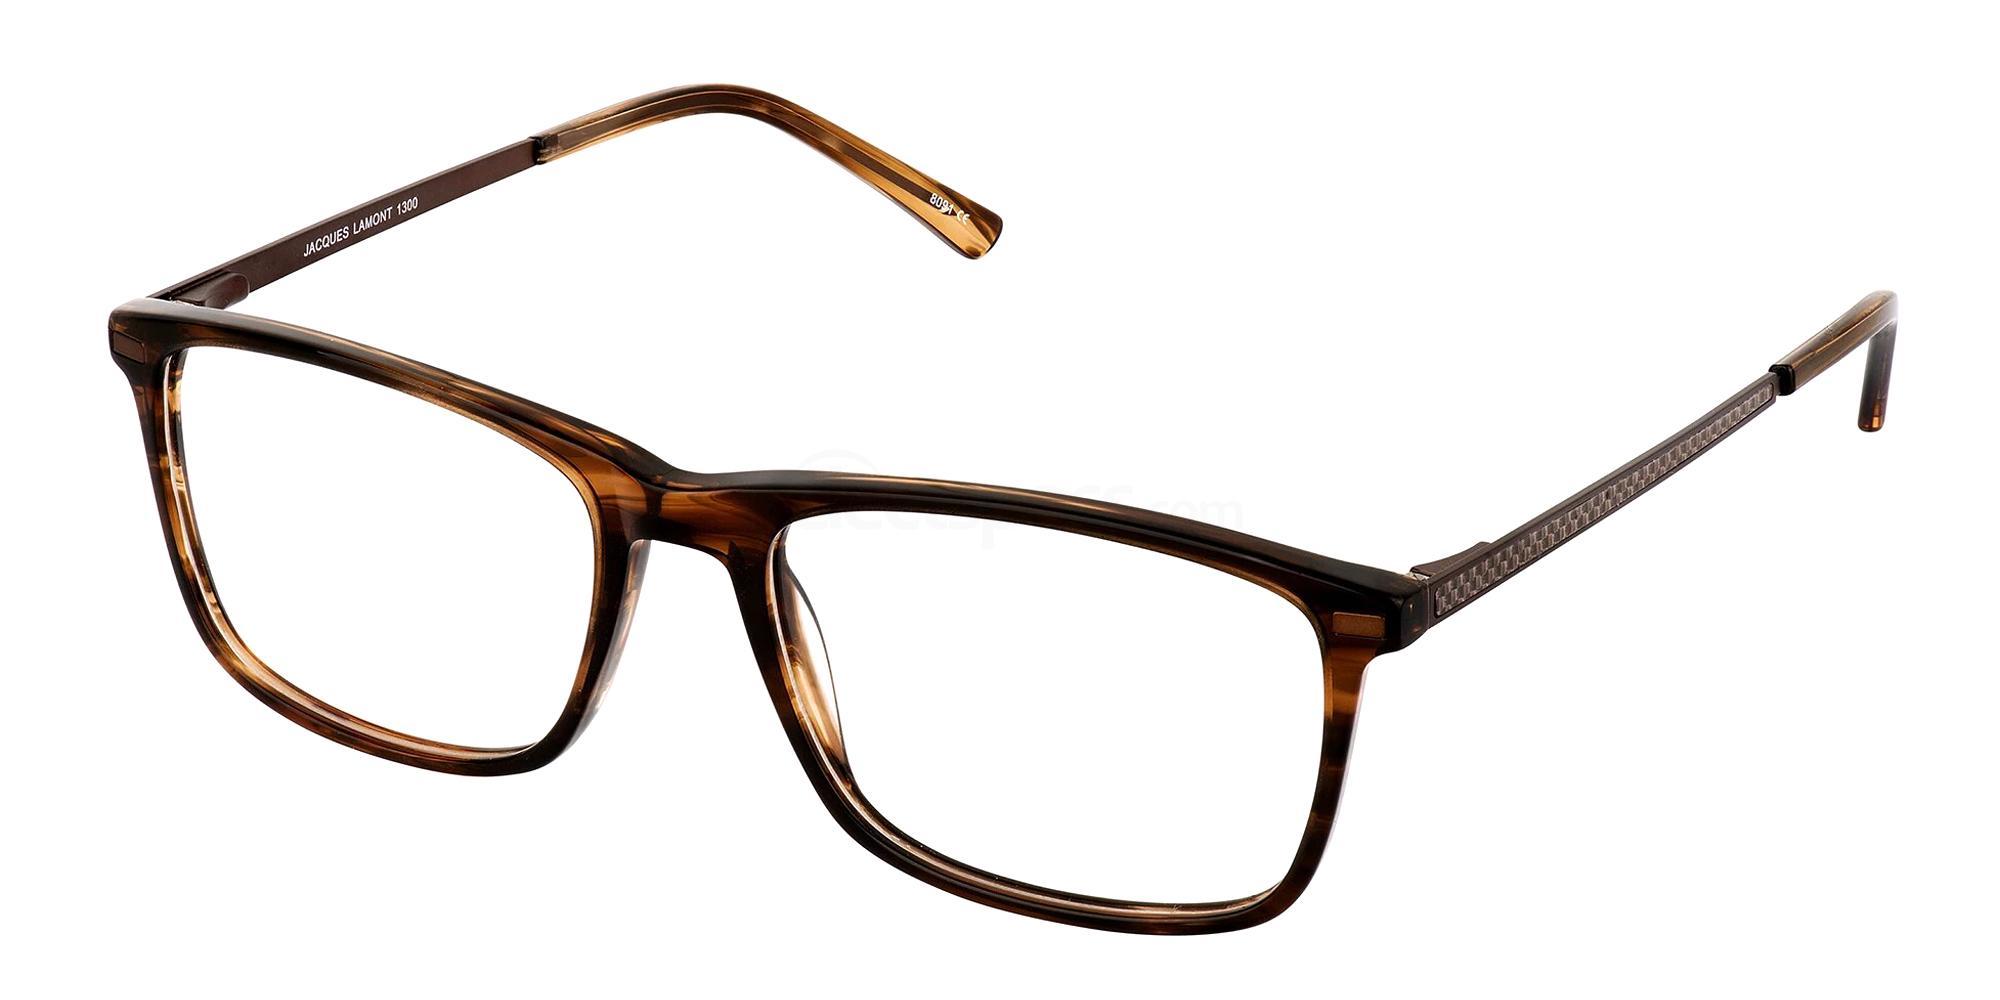 Brown 1300 Glasses, Jacques Lamont